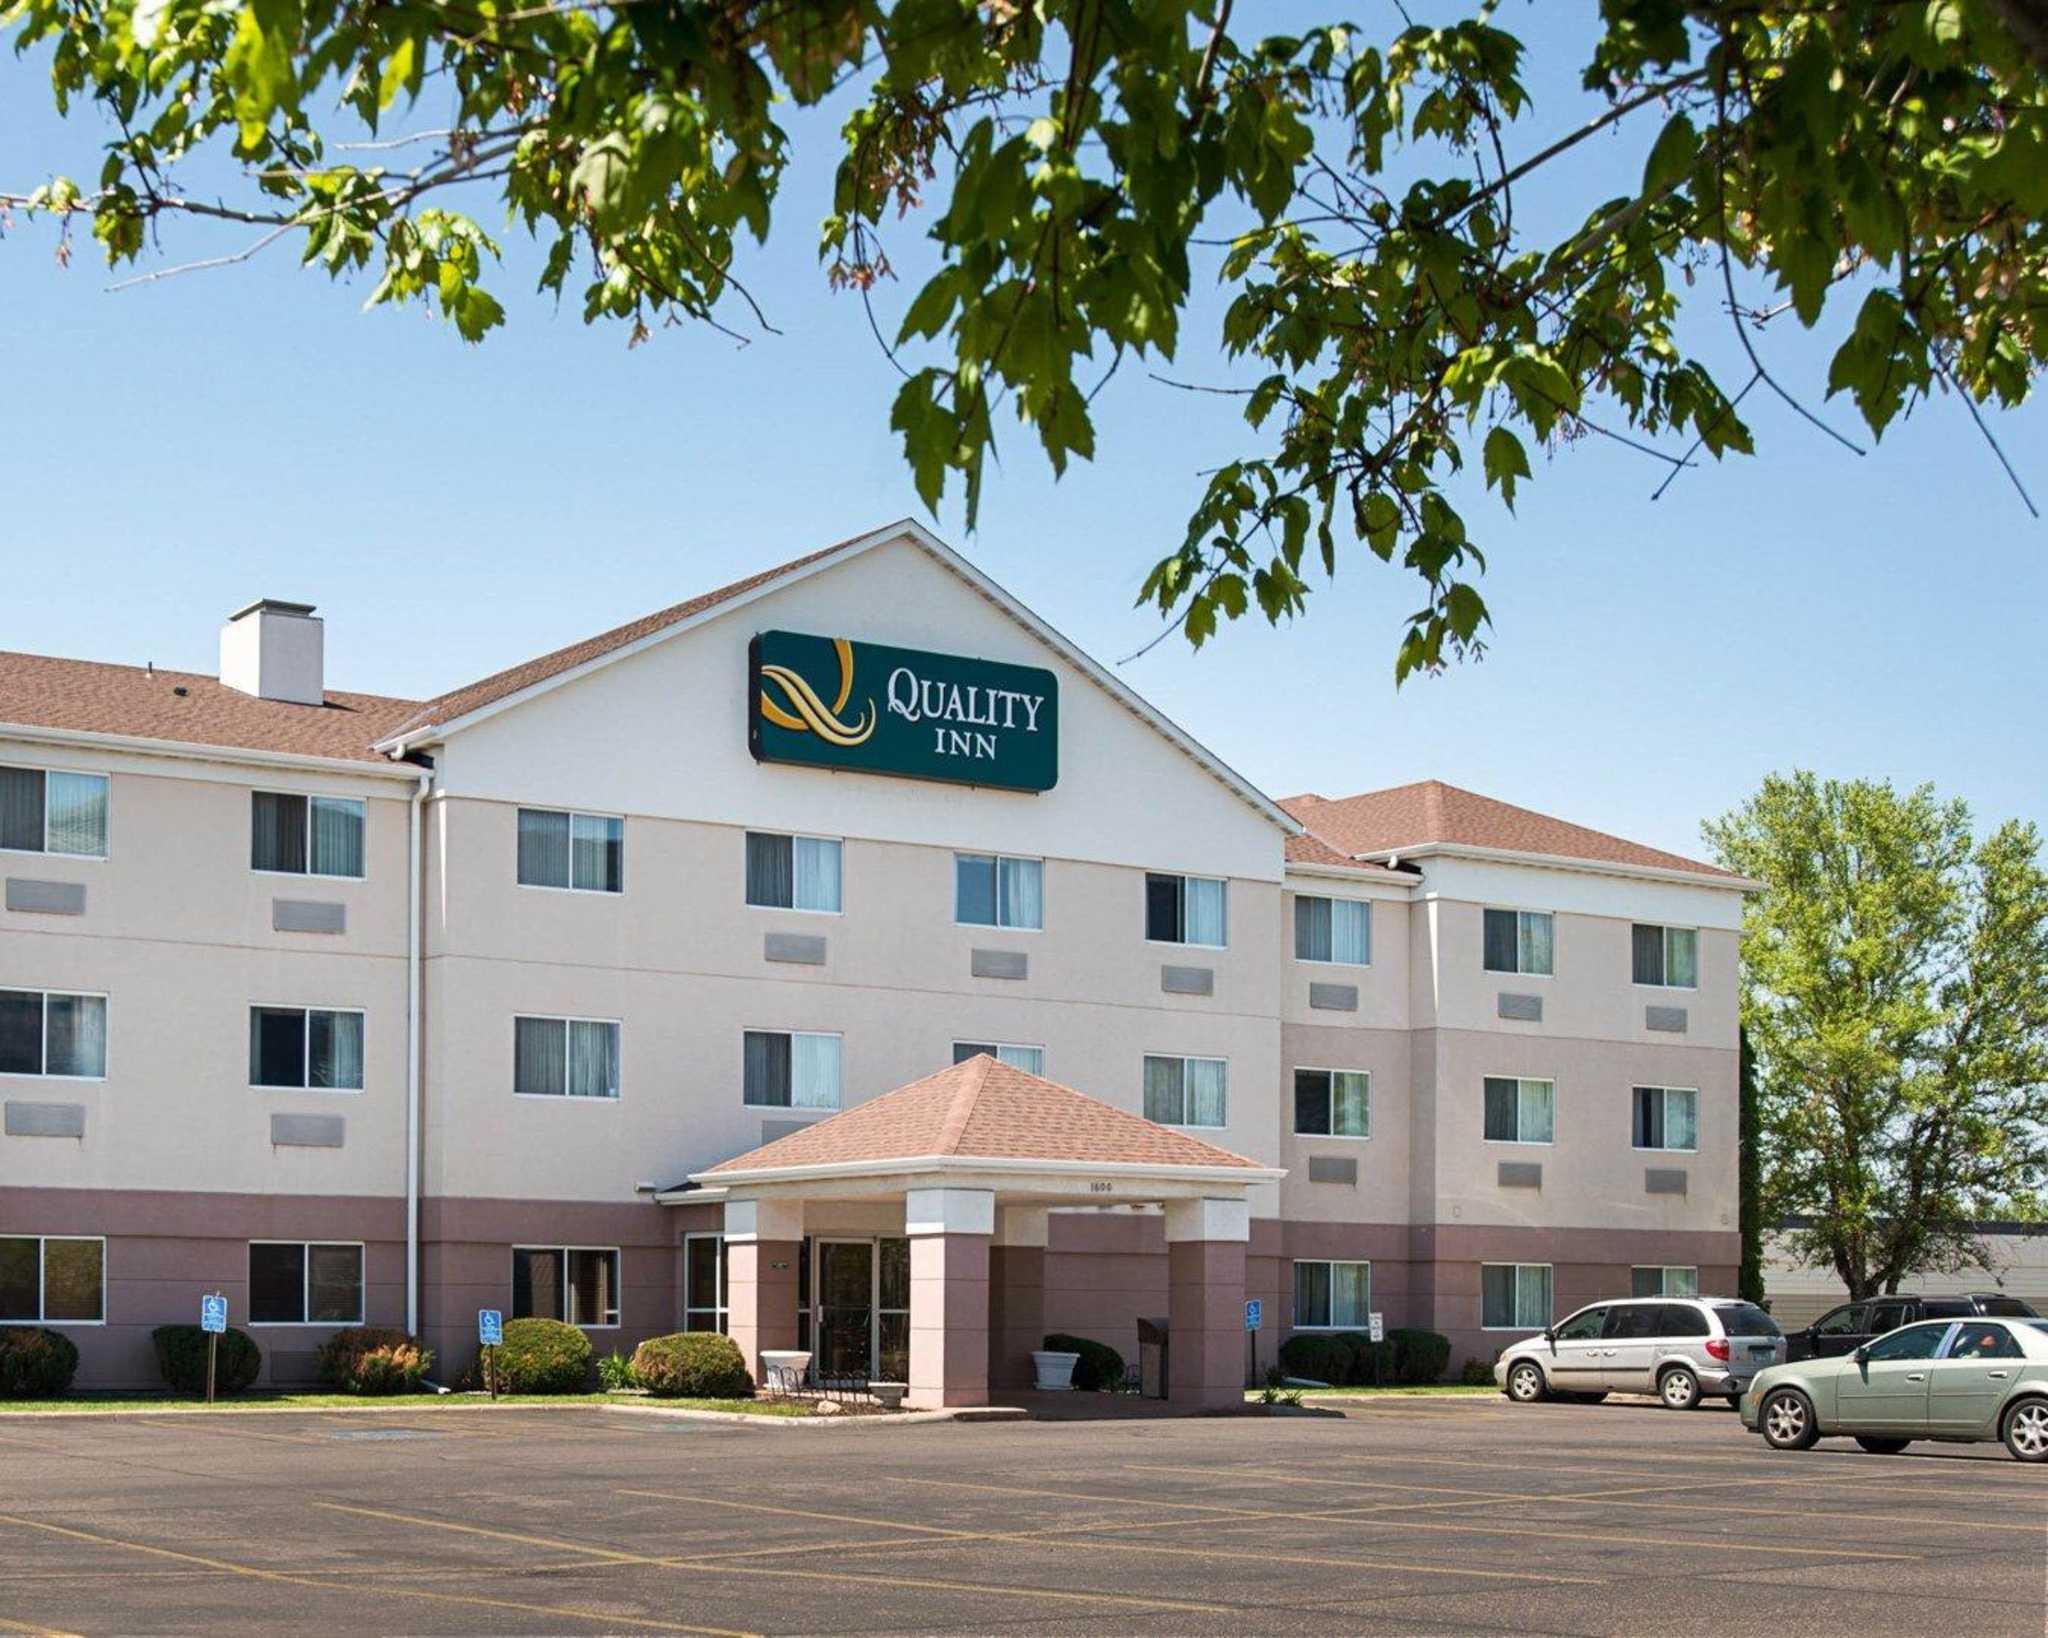 Quality Inn Brooklyn Center Minnesota MN  LocalDatabasecom